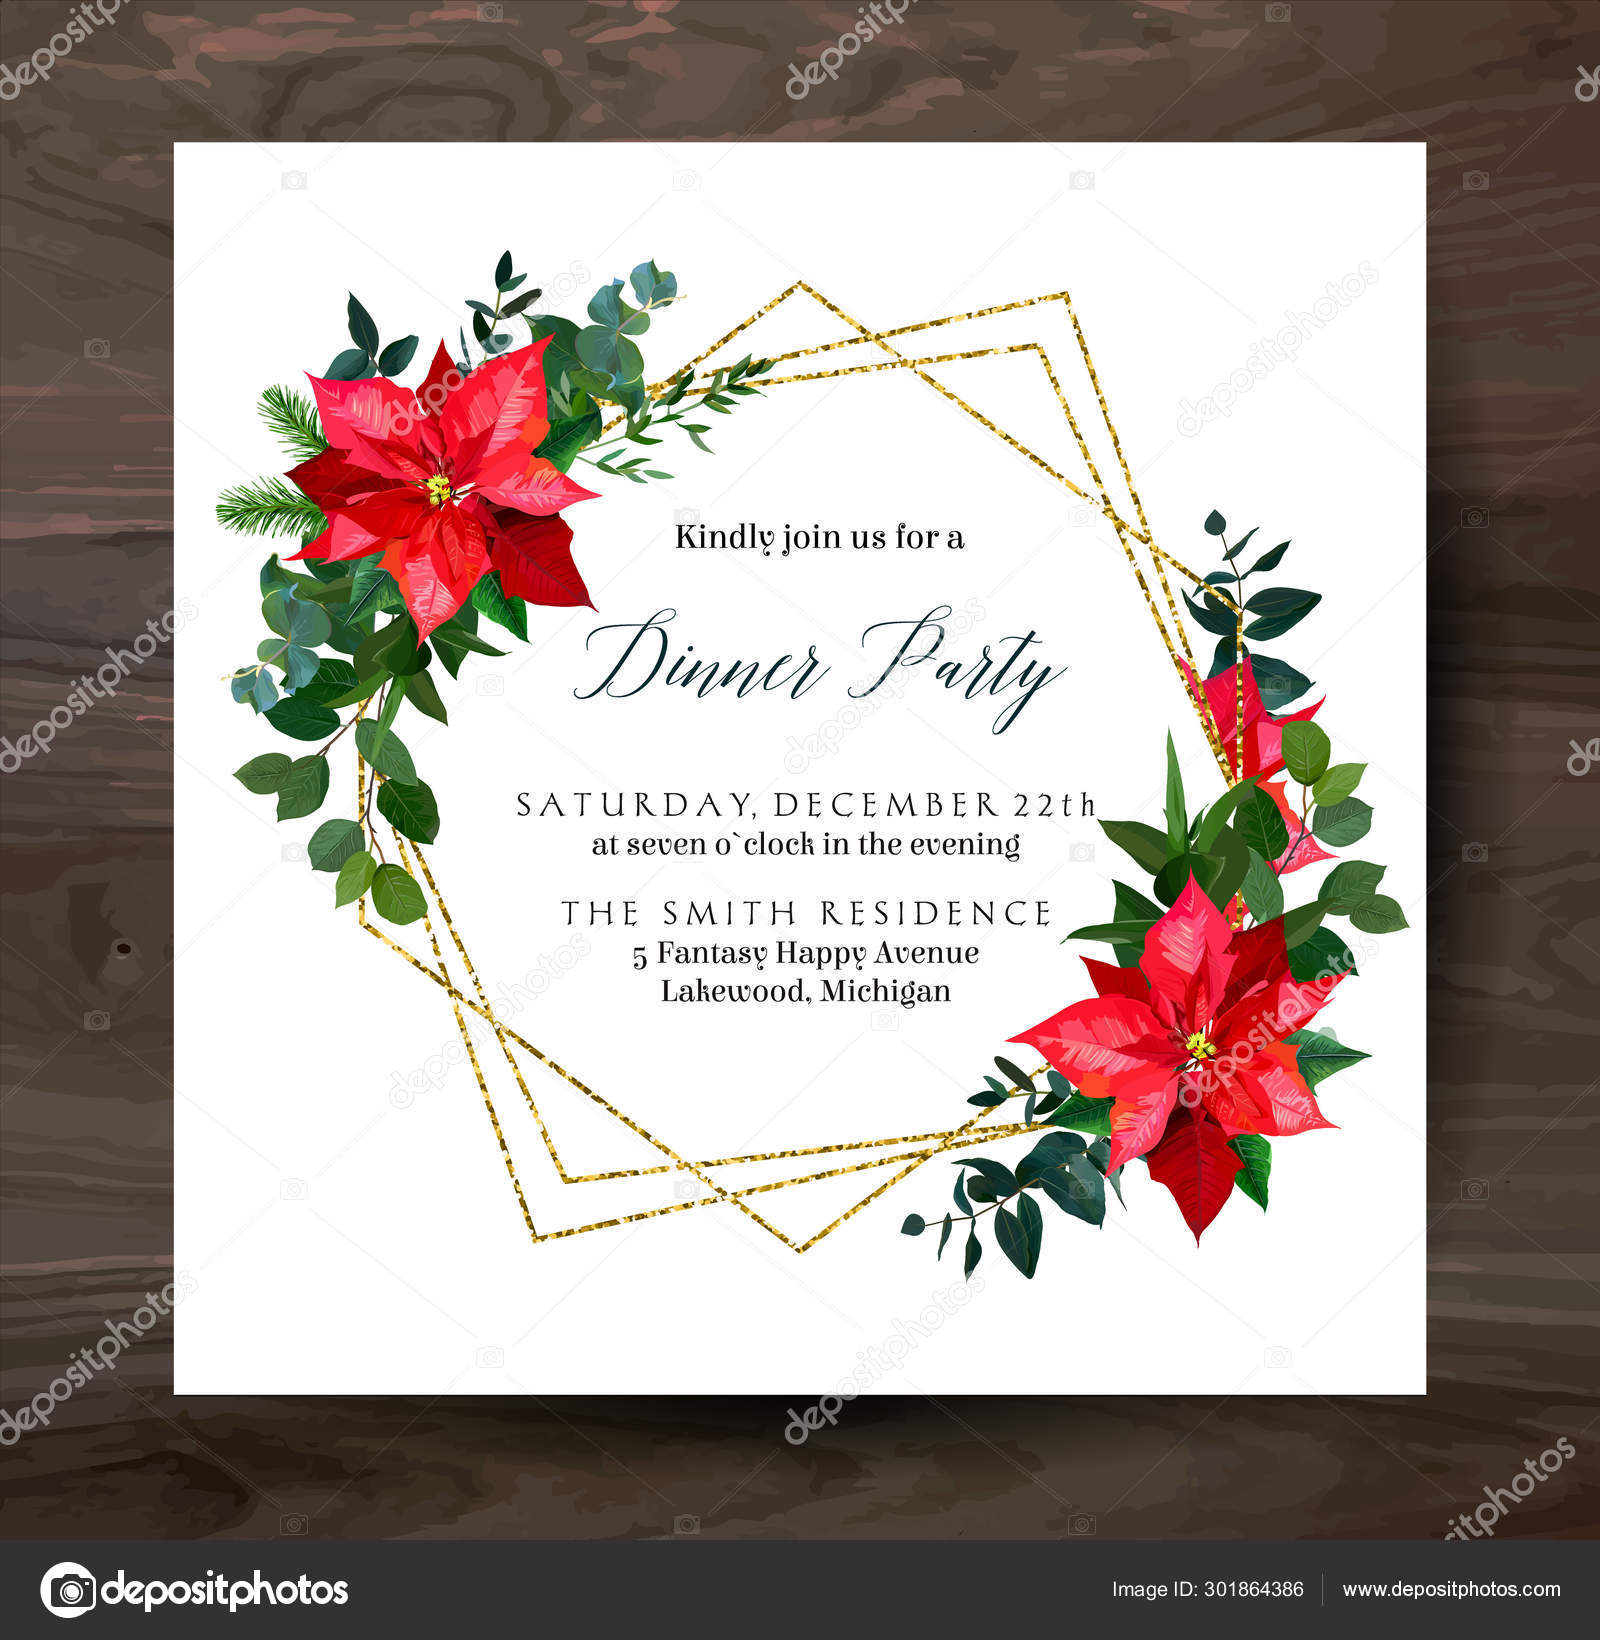 Christmas Greenery Vector.Red Poinsettia Flowers Christmas Greenery Mix Of Seasonal